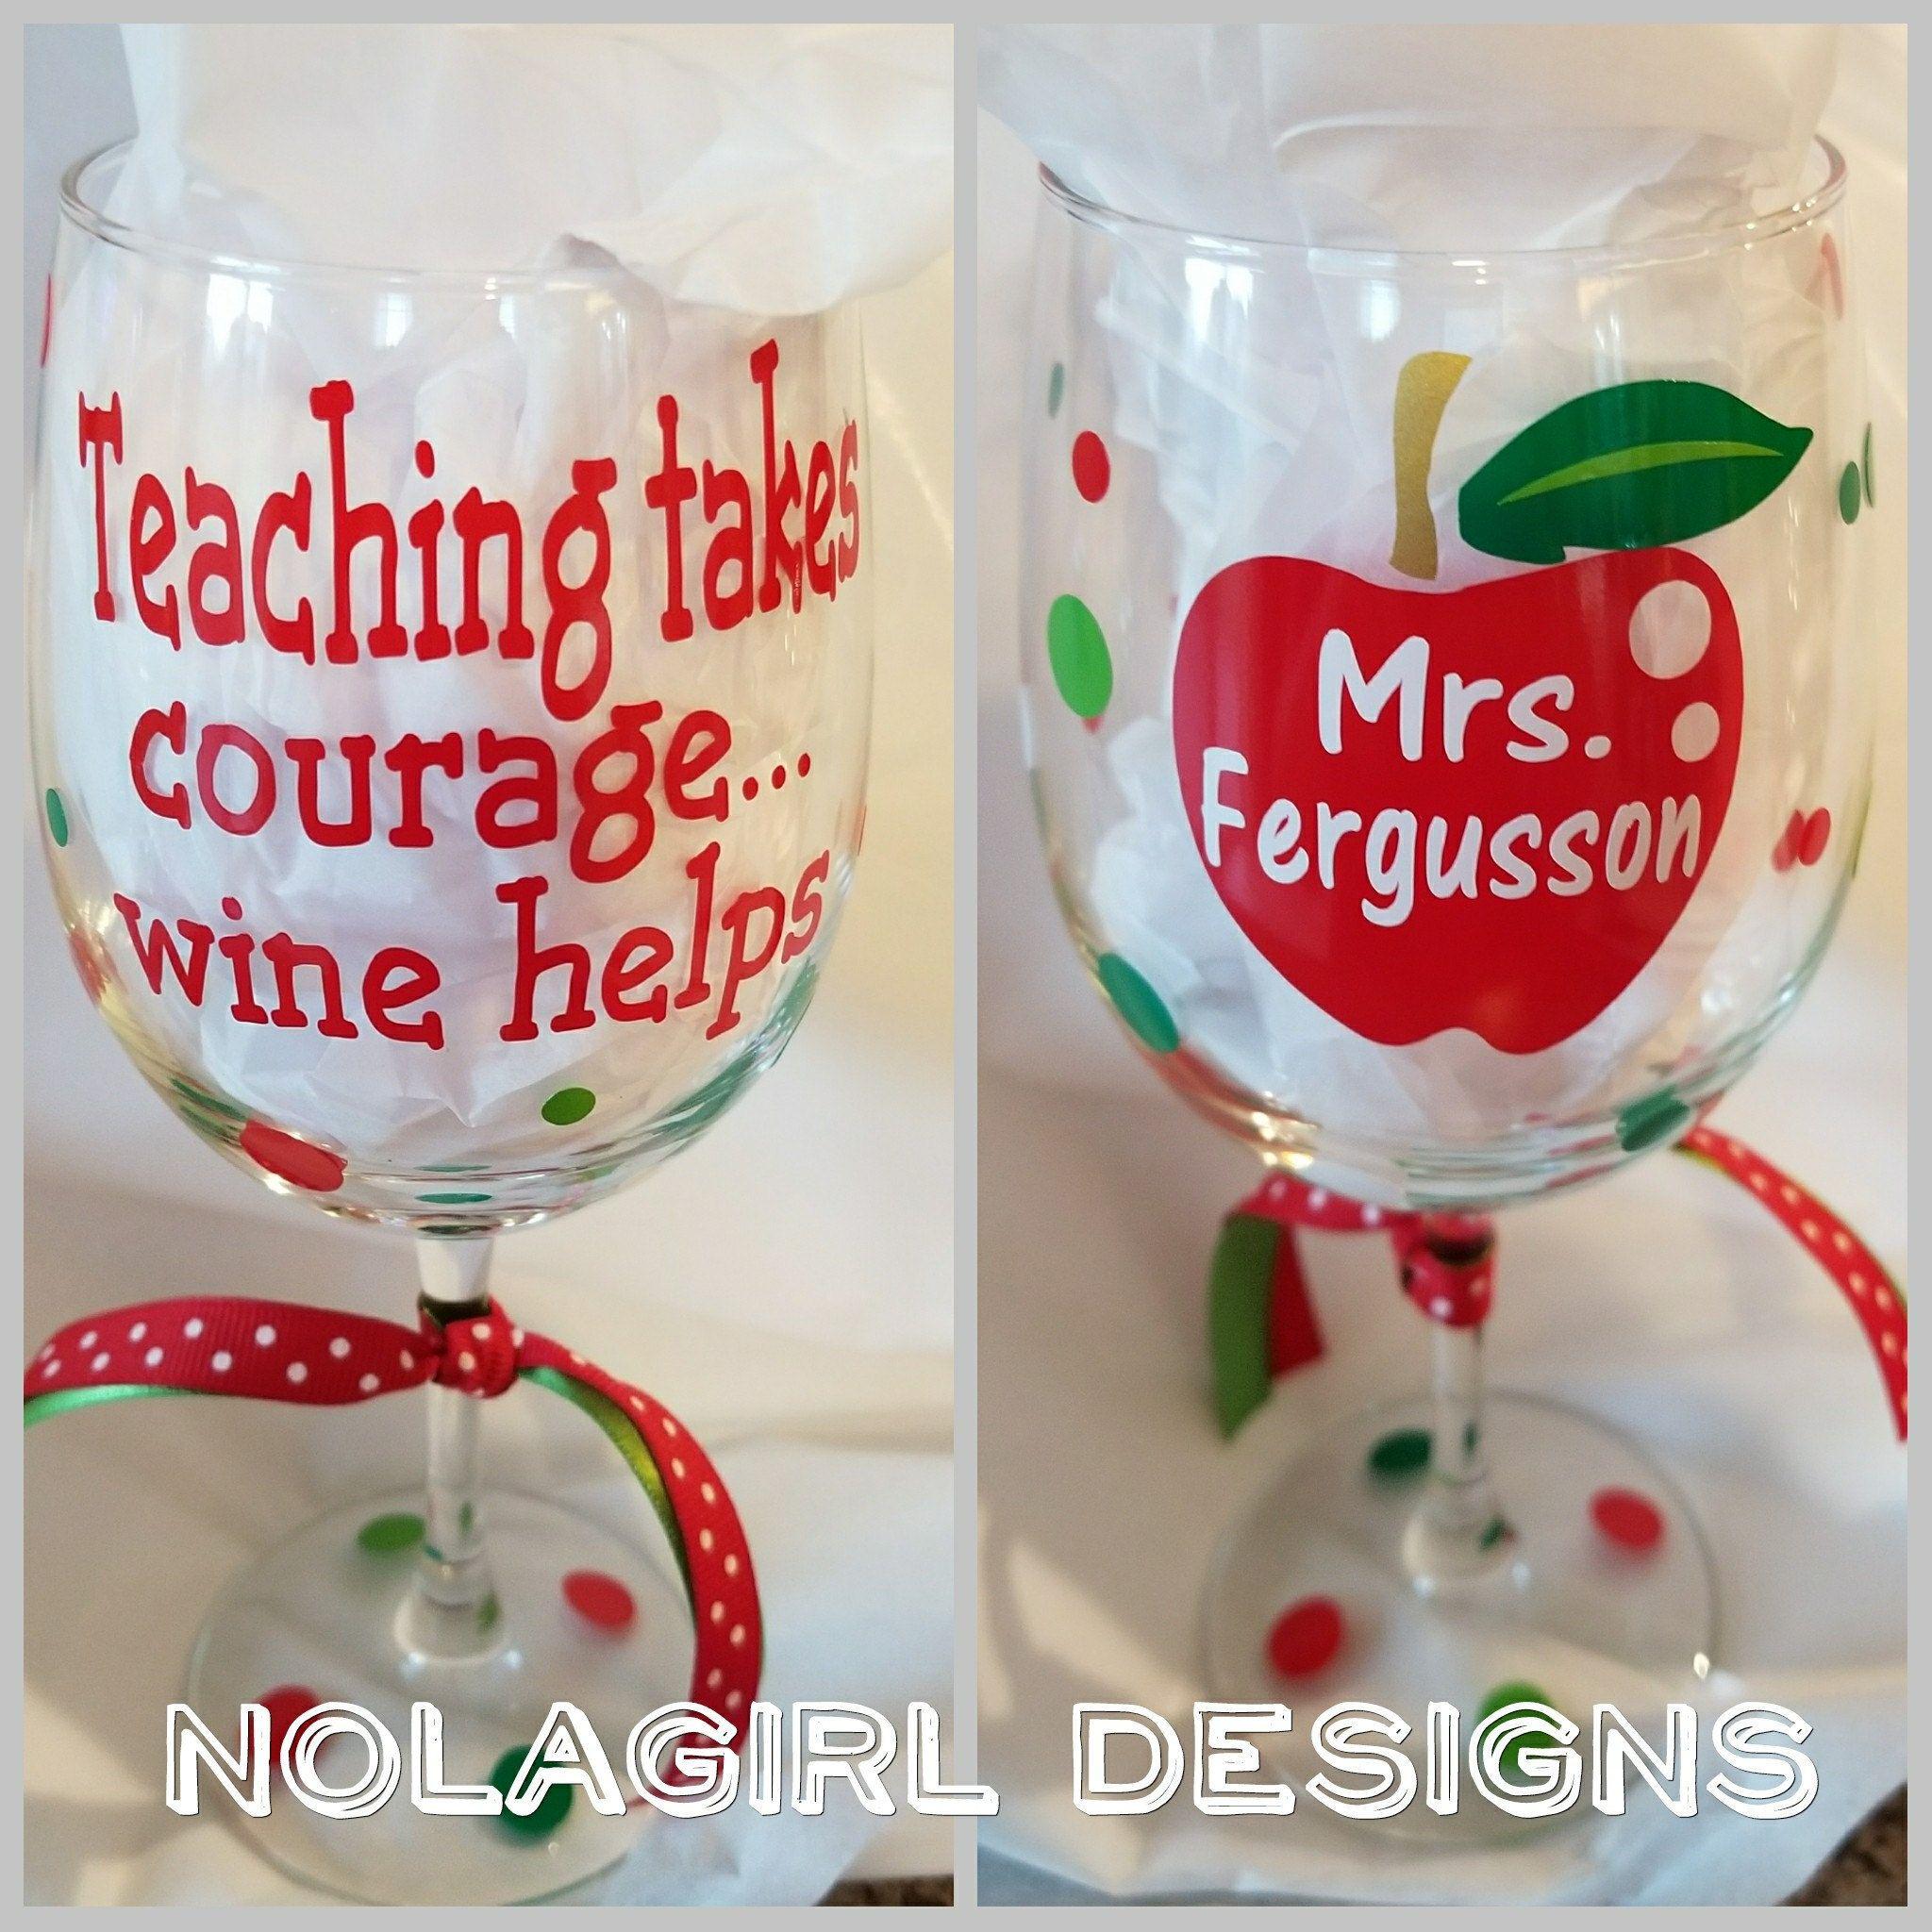 Teach Teacher Teachergift Southern Fun Customdesigns Cup Shopwithme Ladies Shopsmall Custom Personal Wine Gifts Diy Wine Gifts Painted Wine Glasses